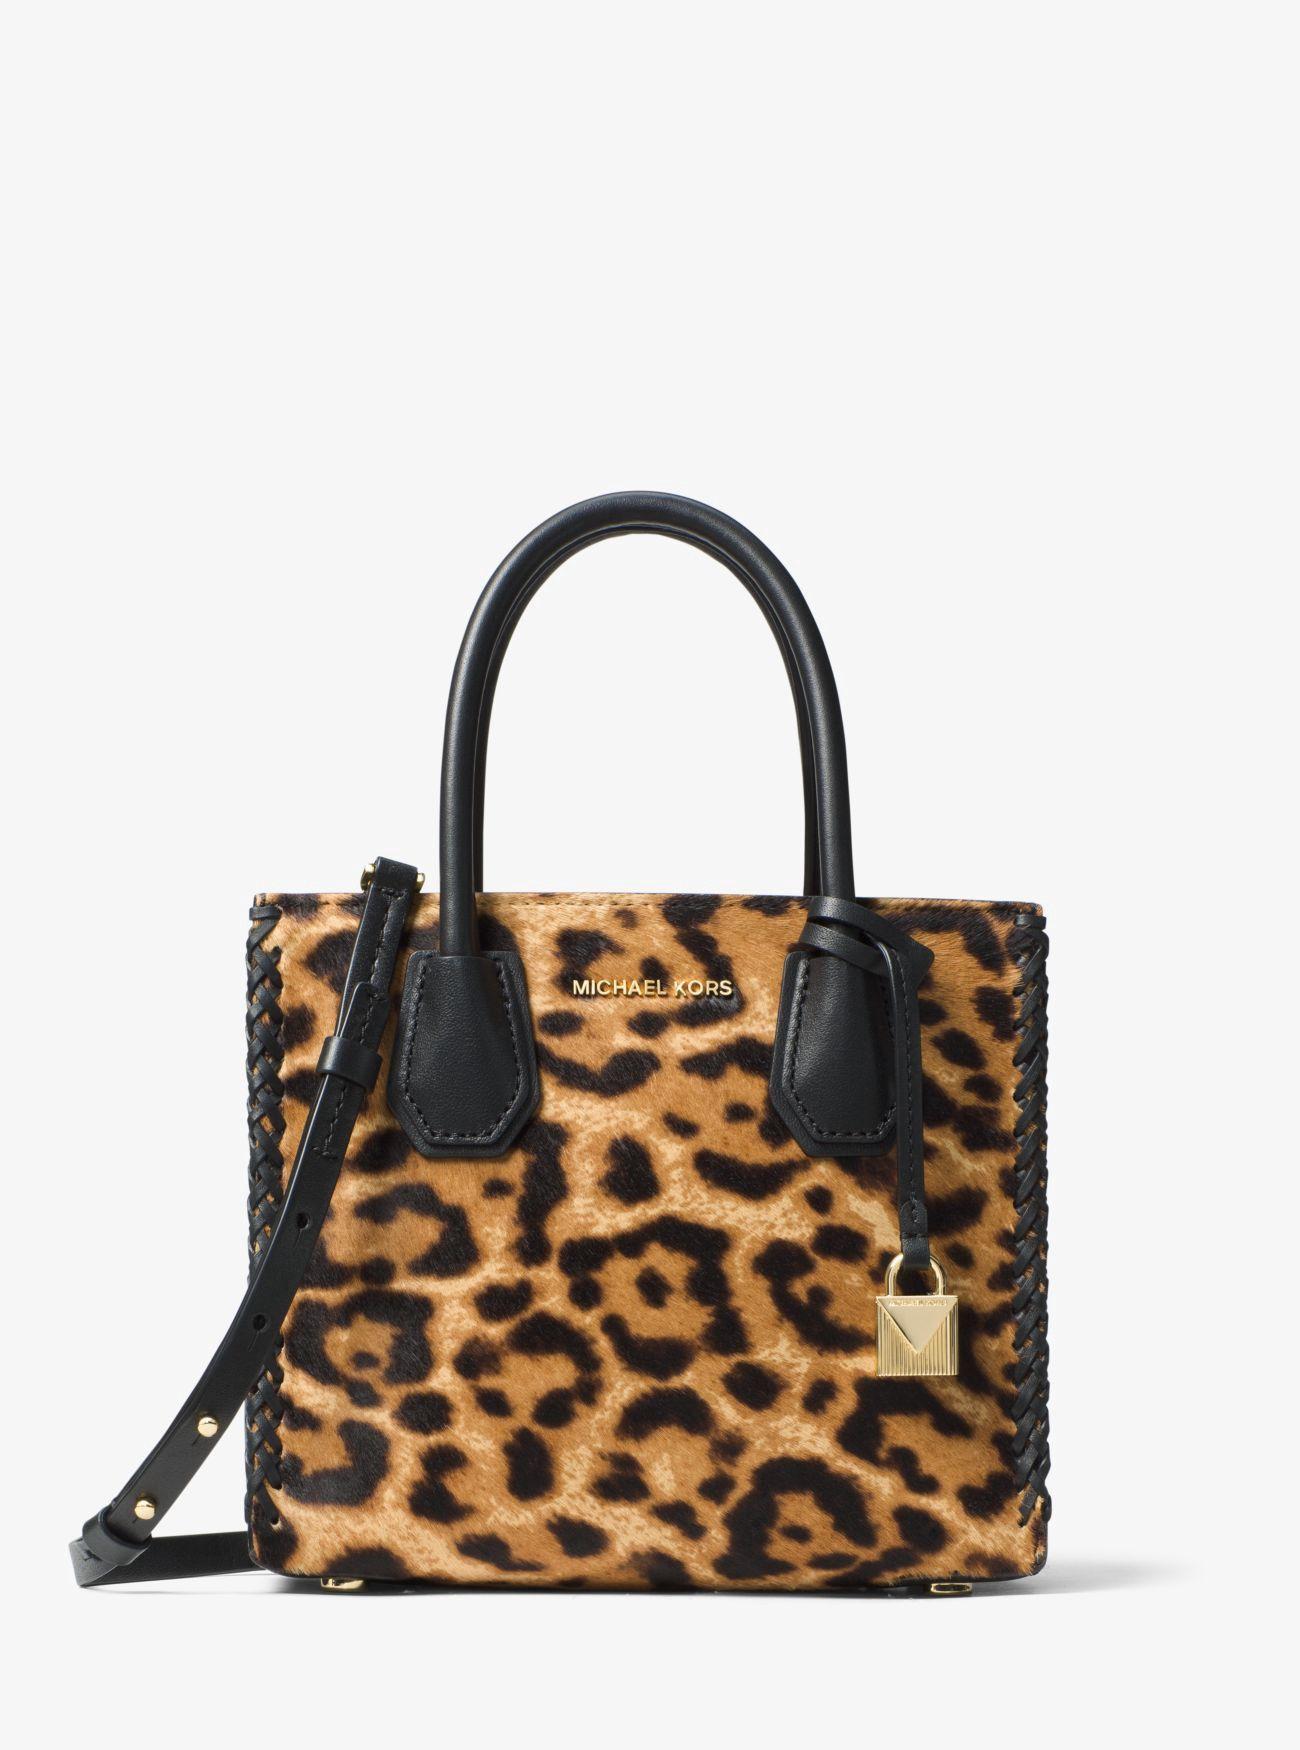 ff4cb5c8fb4d MICHAEL KORS Mercer Leopard Calf Hair Crossbody. #michaelkors #bags #canvas  #fur #crossbody #lining #polyester #shoulder bags #hand bags #